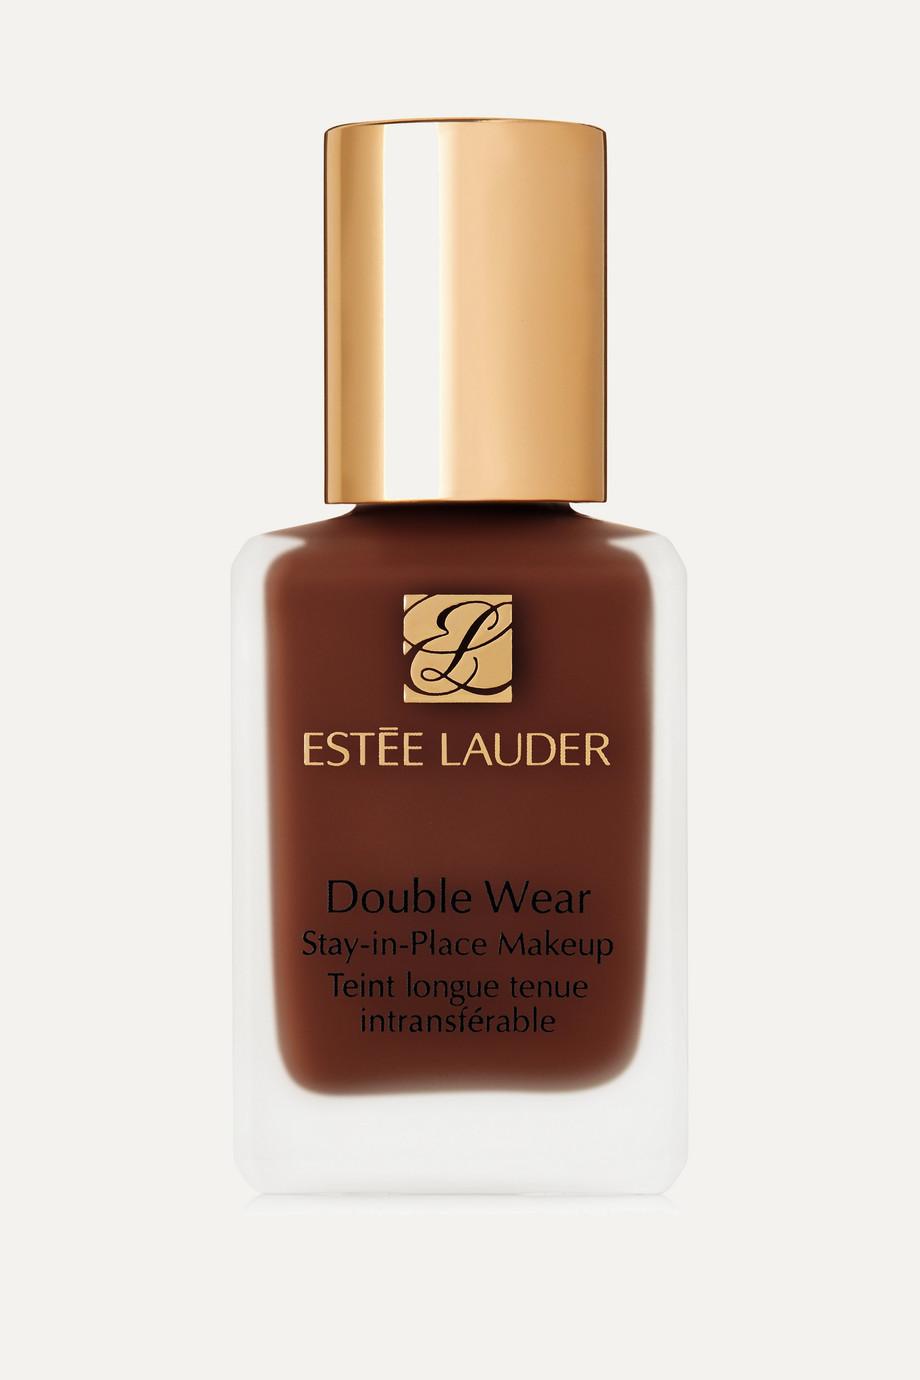 Estée Lauder Double Wear Stay-in-Place Makeup SPF10 - Deep Amber 7N1